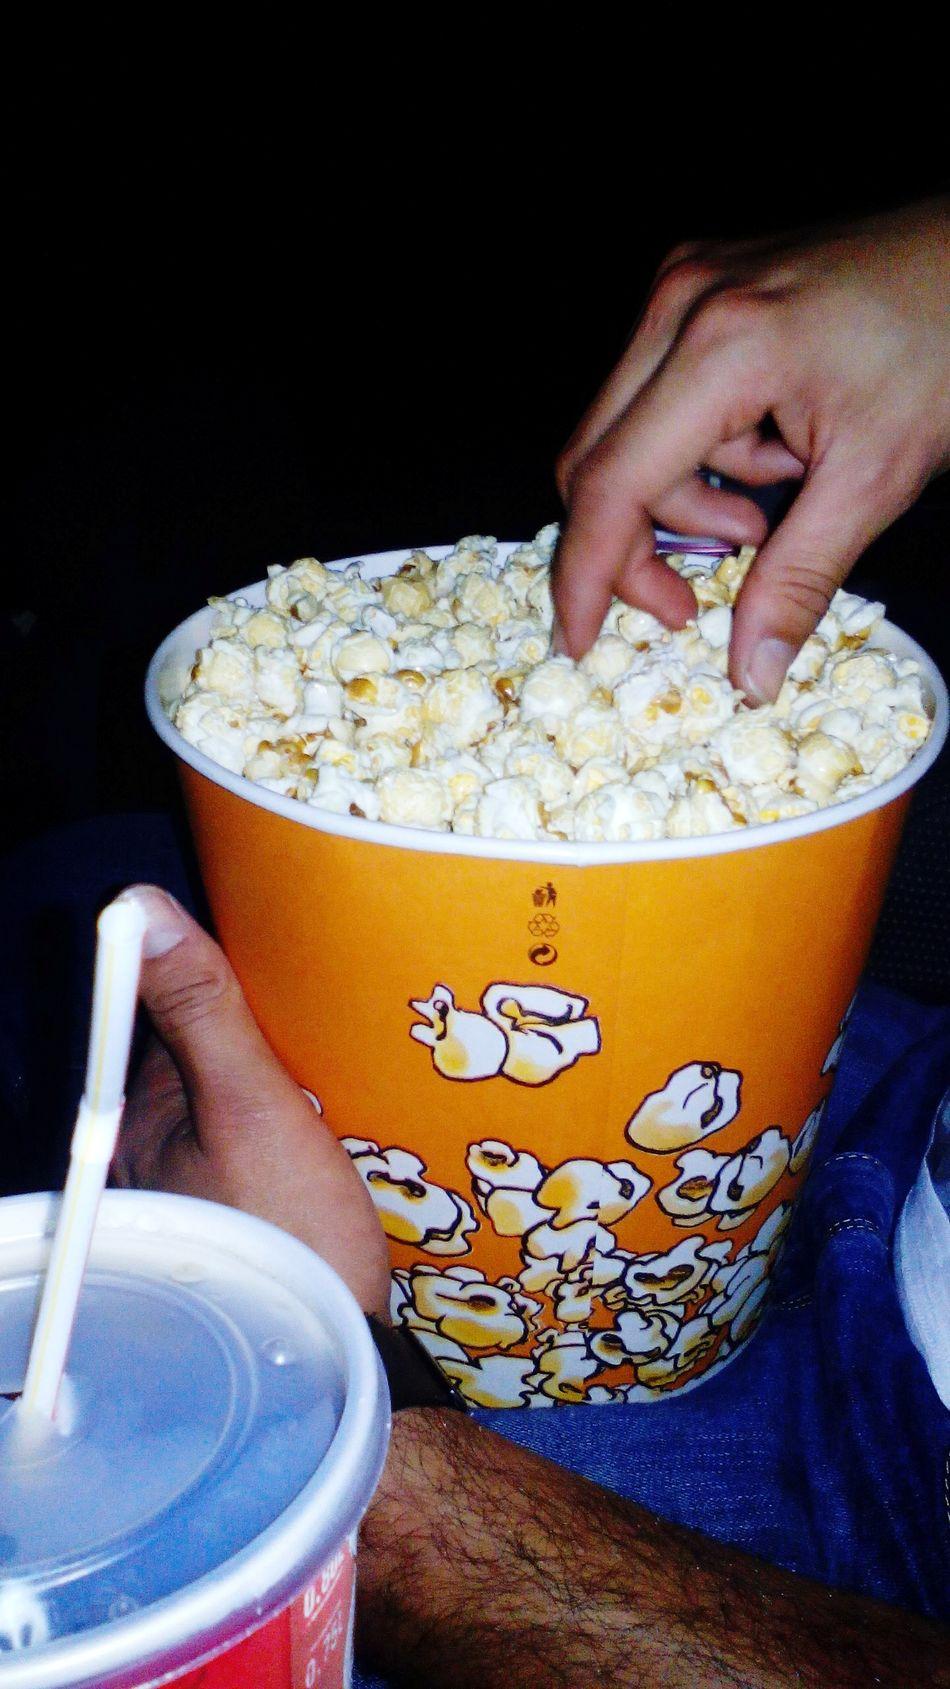 Cinema Thehungergames Chato ❤❤✌🍔🍫🍬🍷🍺👏👍